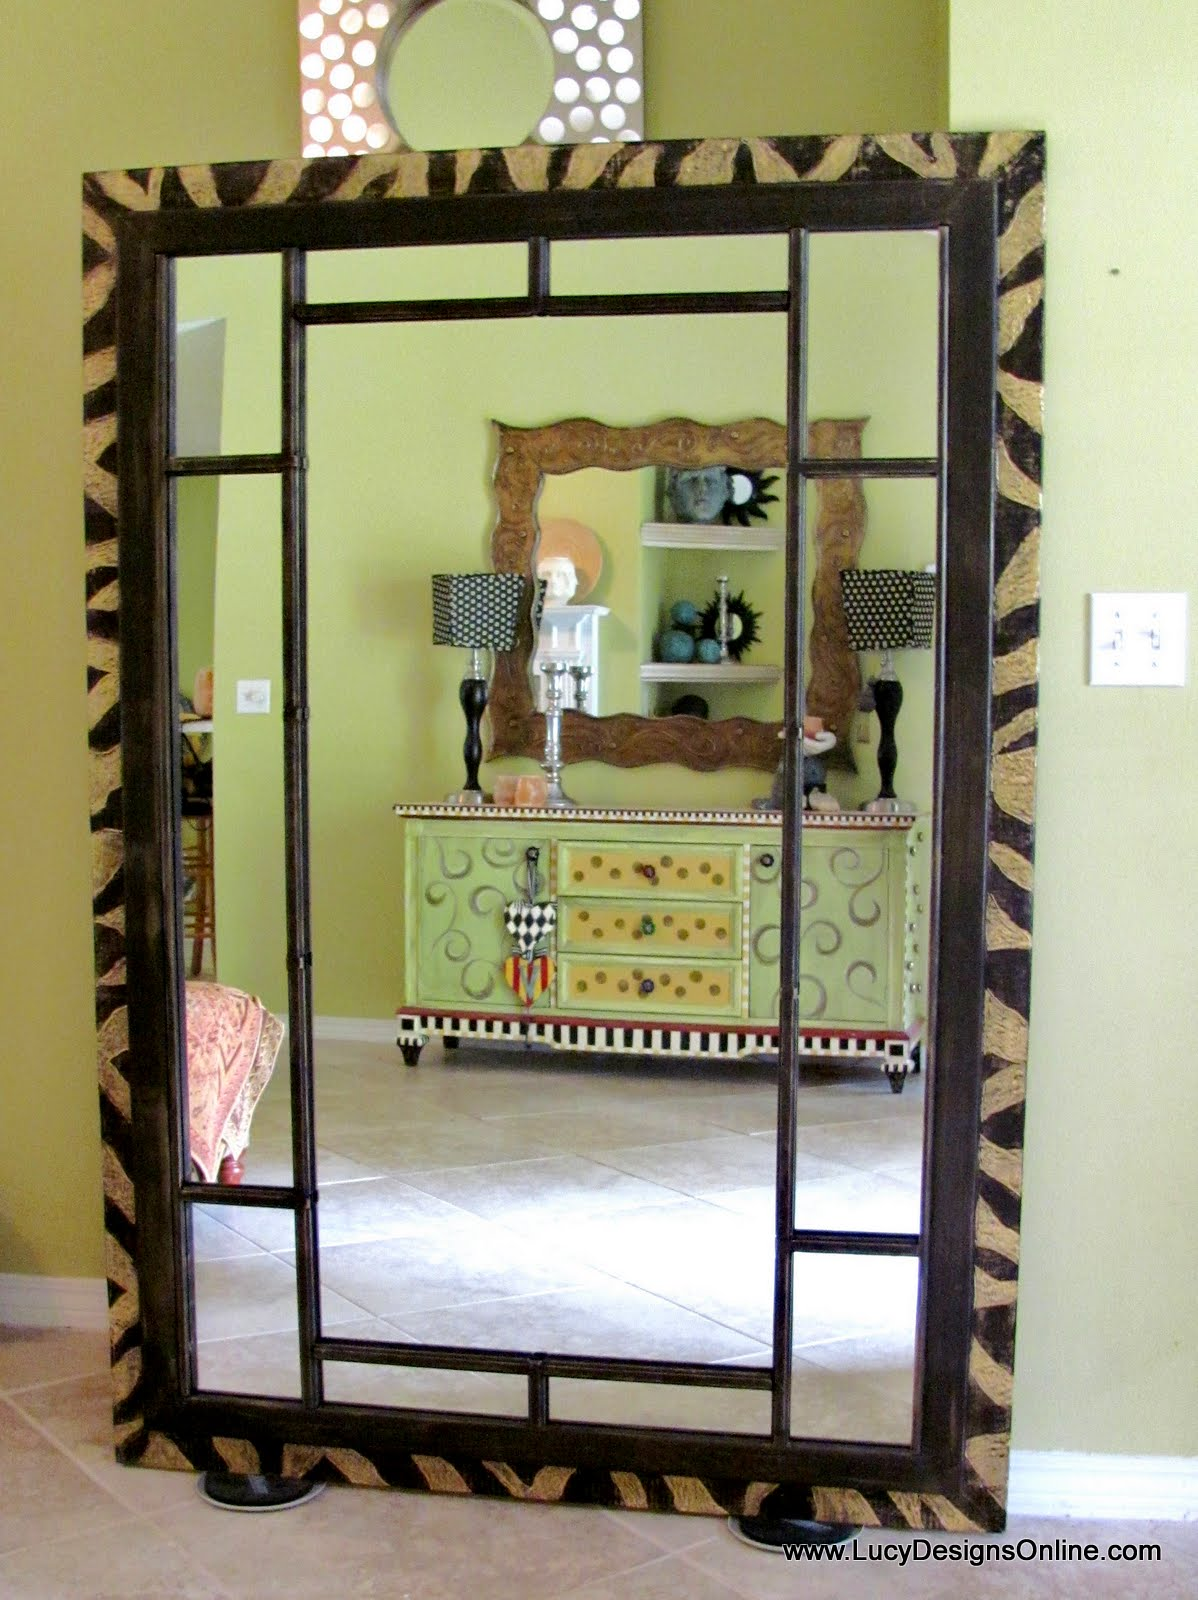 Diy Mirror Dremel Carved Zebra Pattern On 6 Foot Wood Leaner Mirror Frame